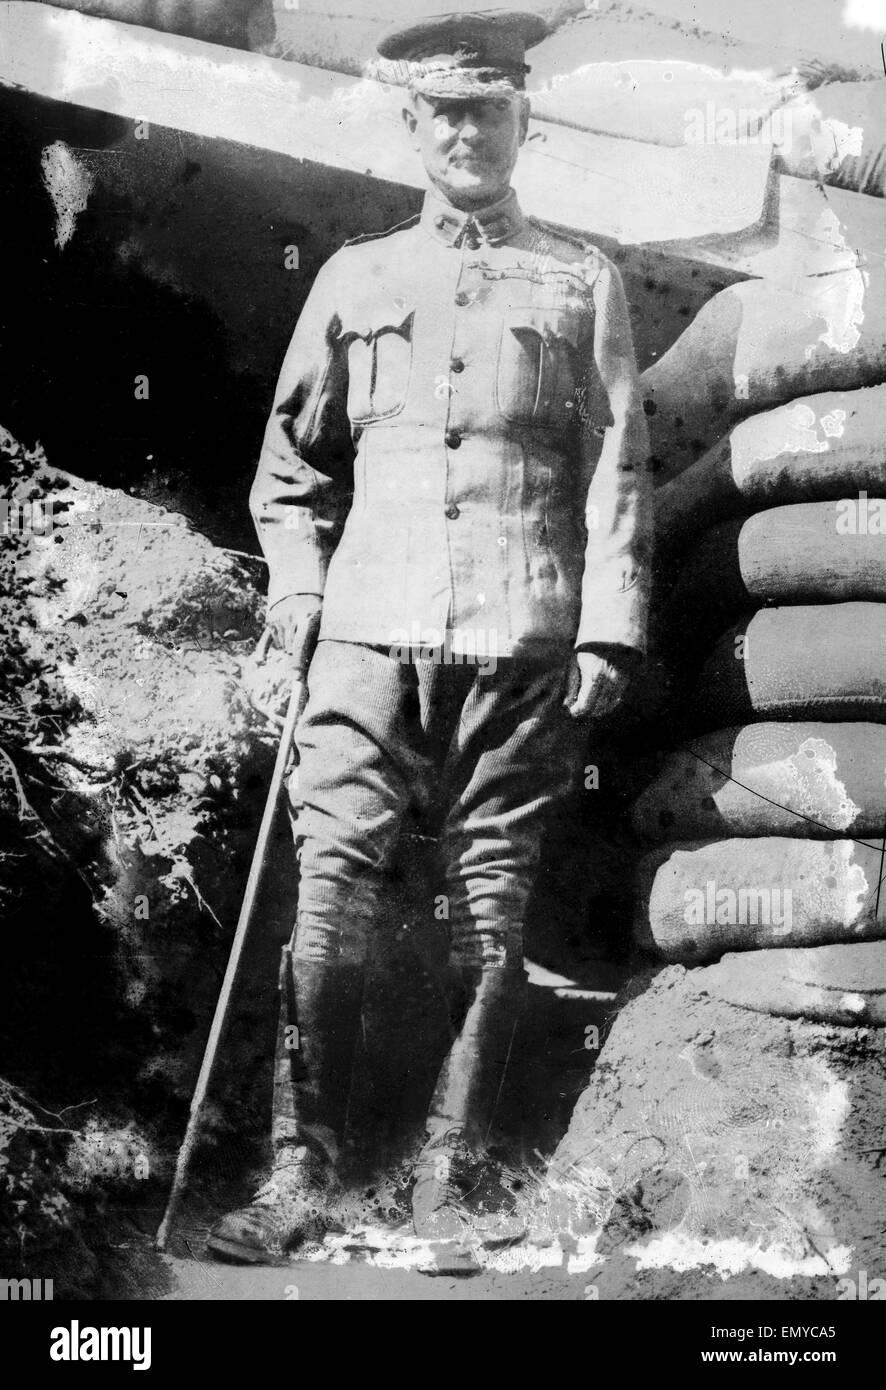 Field Marshal William Riddell Birdwood, 1st Baron Birdwood (1865 -1951), a British general who served as commander - Stock Image